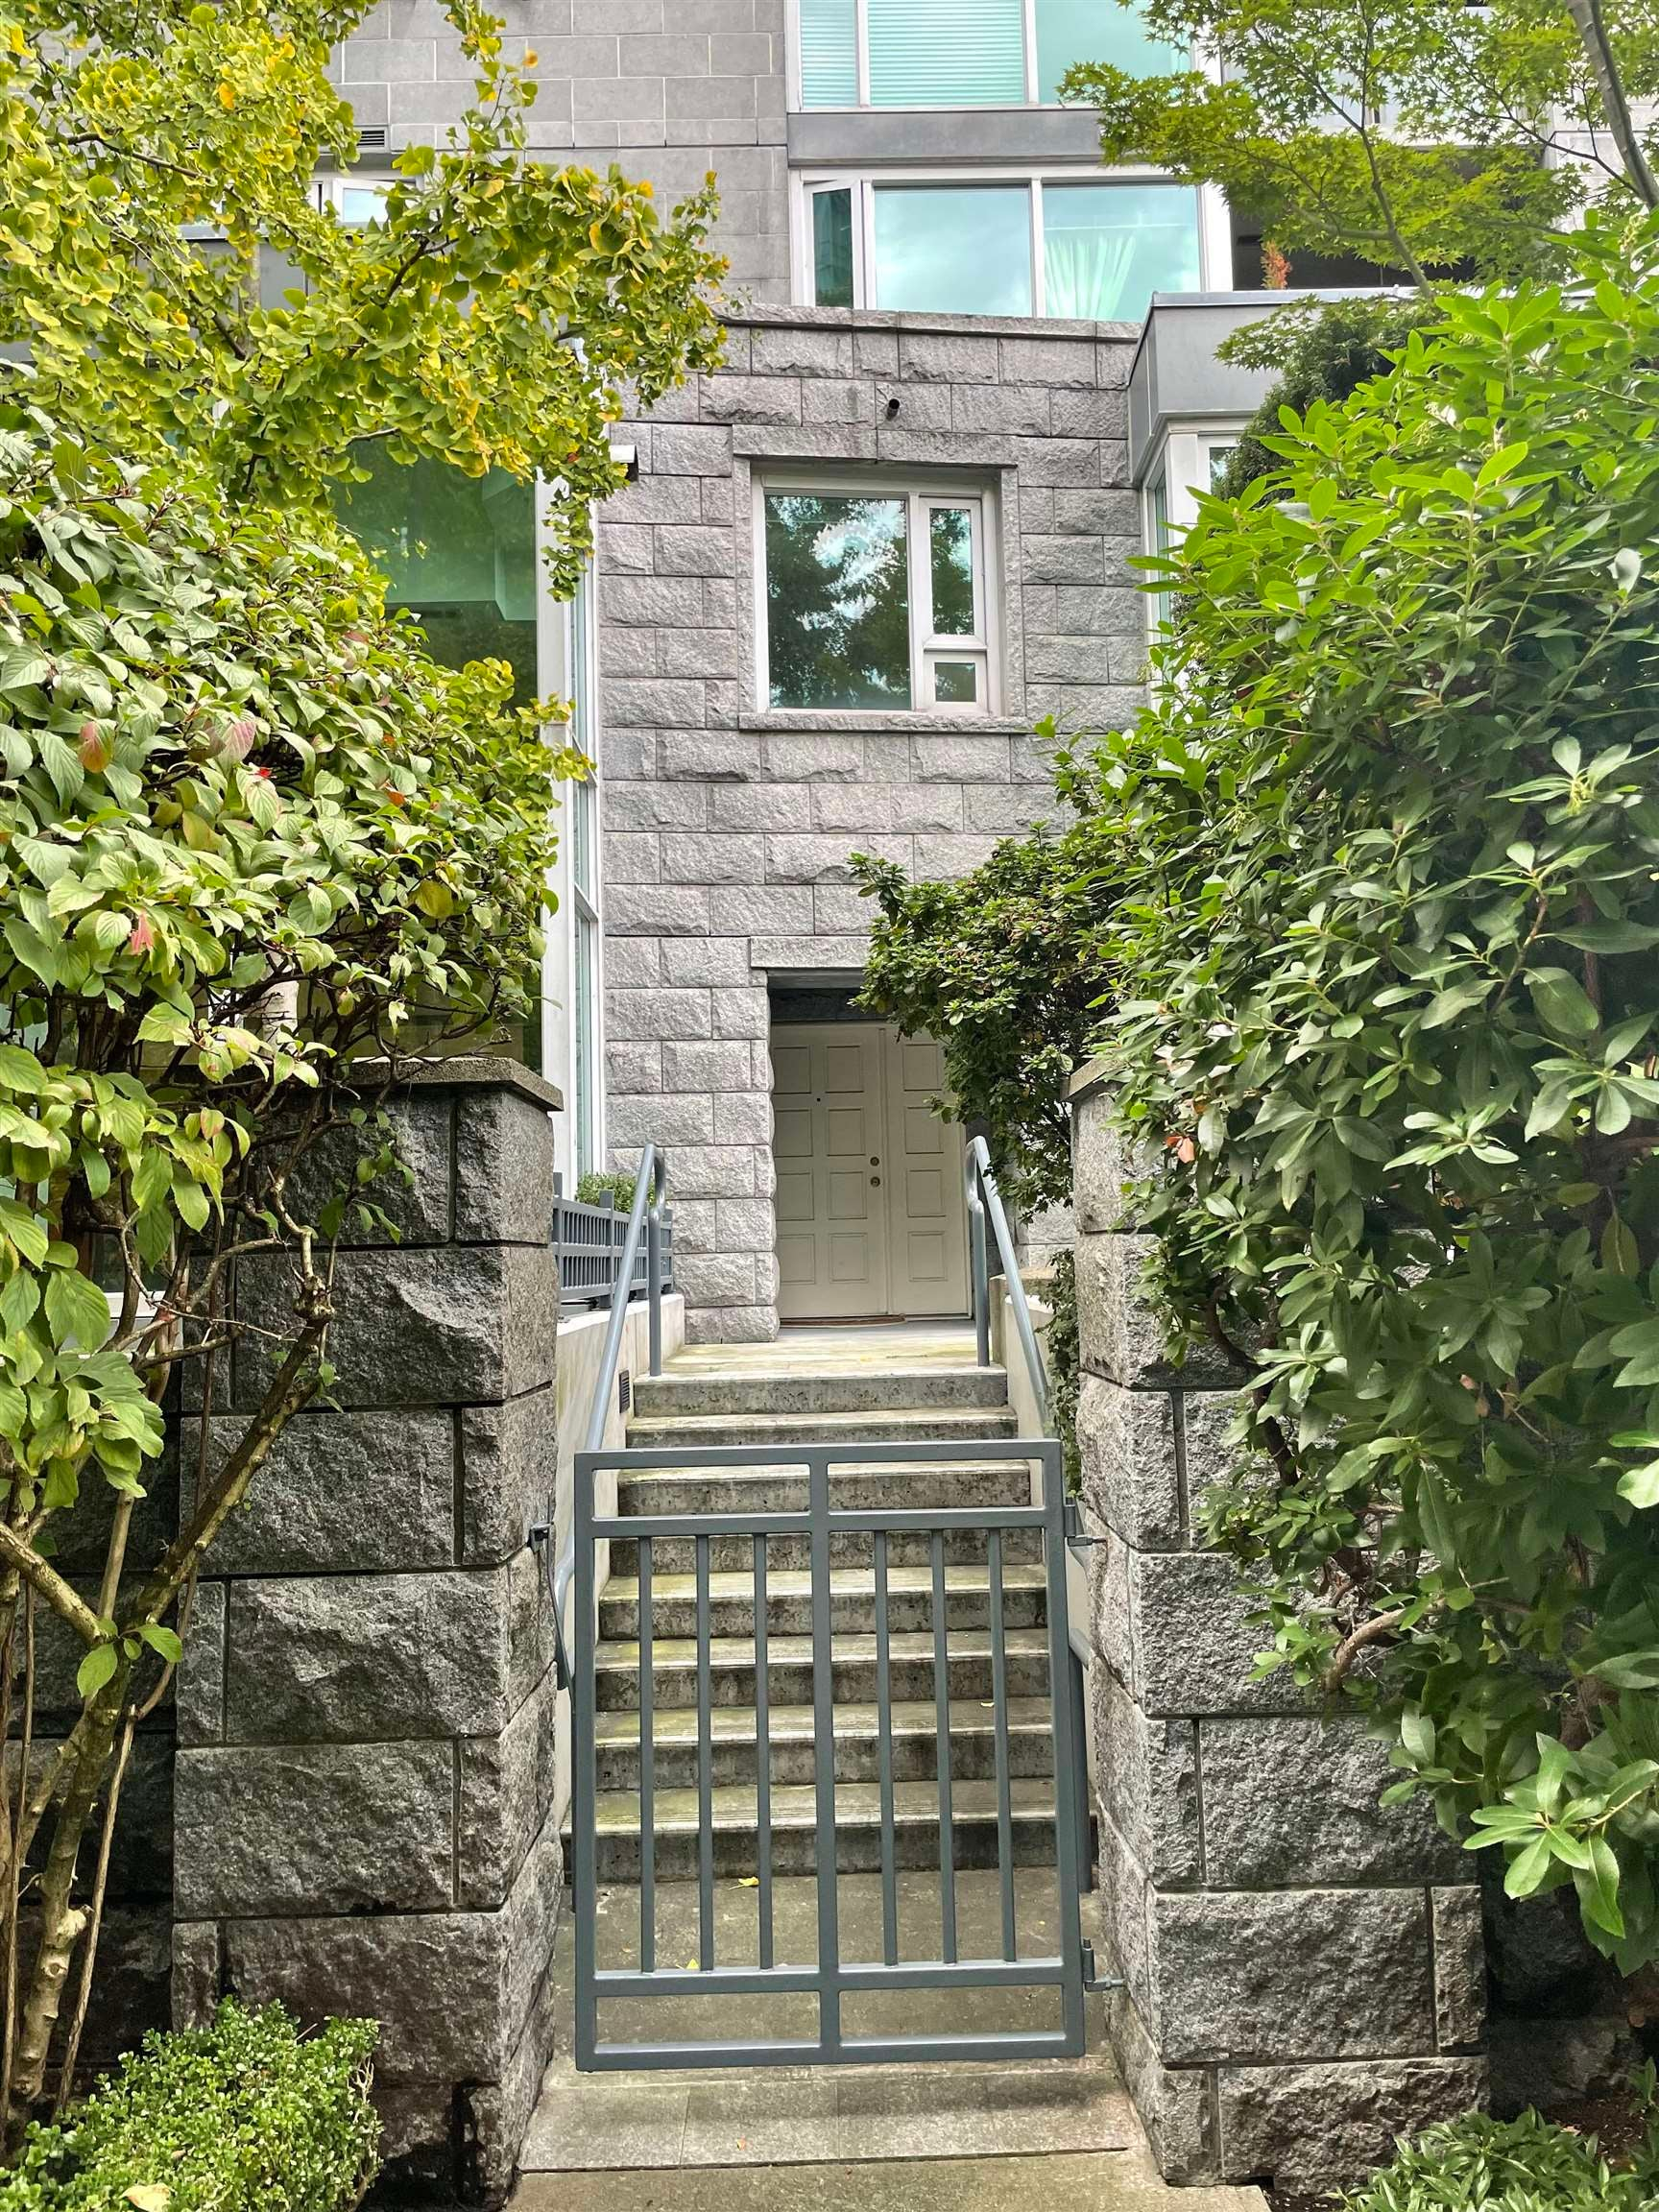 505 NICOLA STREET - Coal Harbour Townhouse for sale, 2 Bedrooms (R2625335)